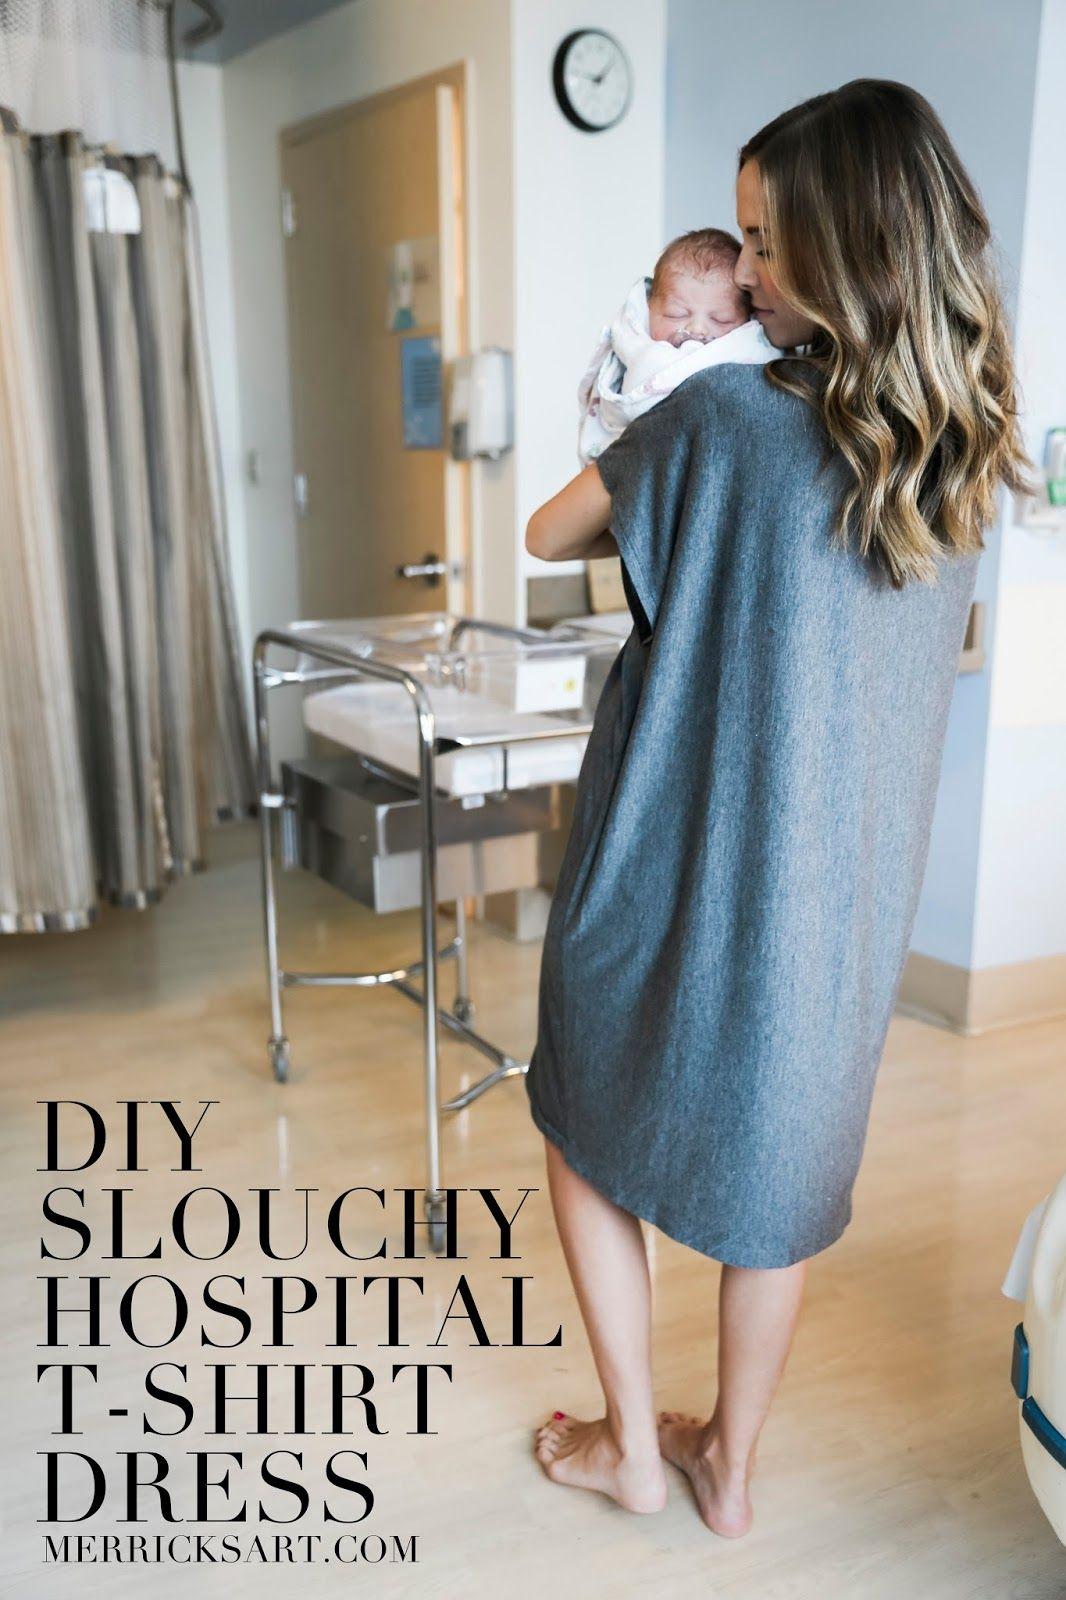 DIY FRIDAY: SLOUCHY HOSPITAL T-SHIRT DRESS | diy clothes | Pinterest ...